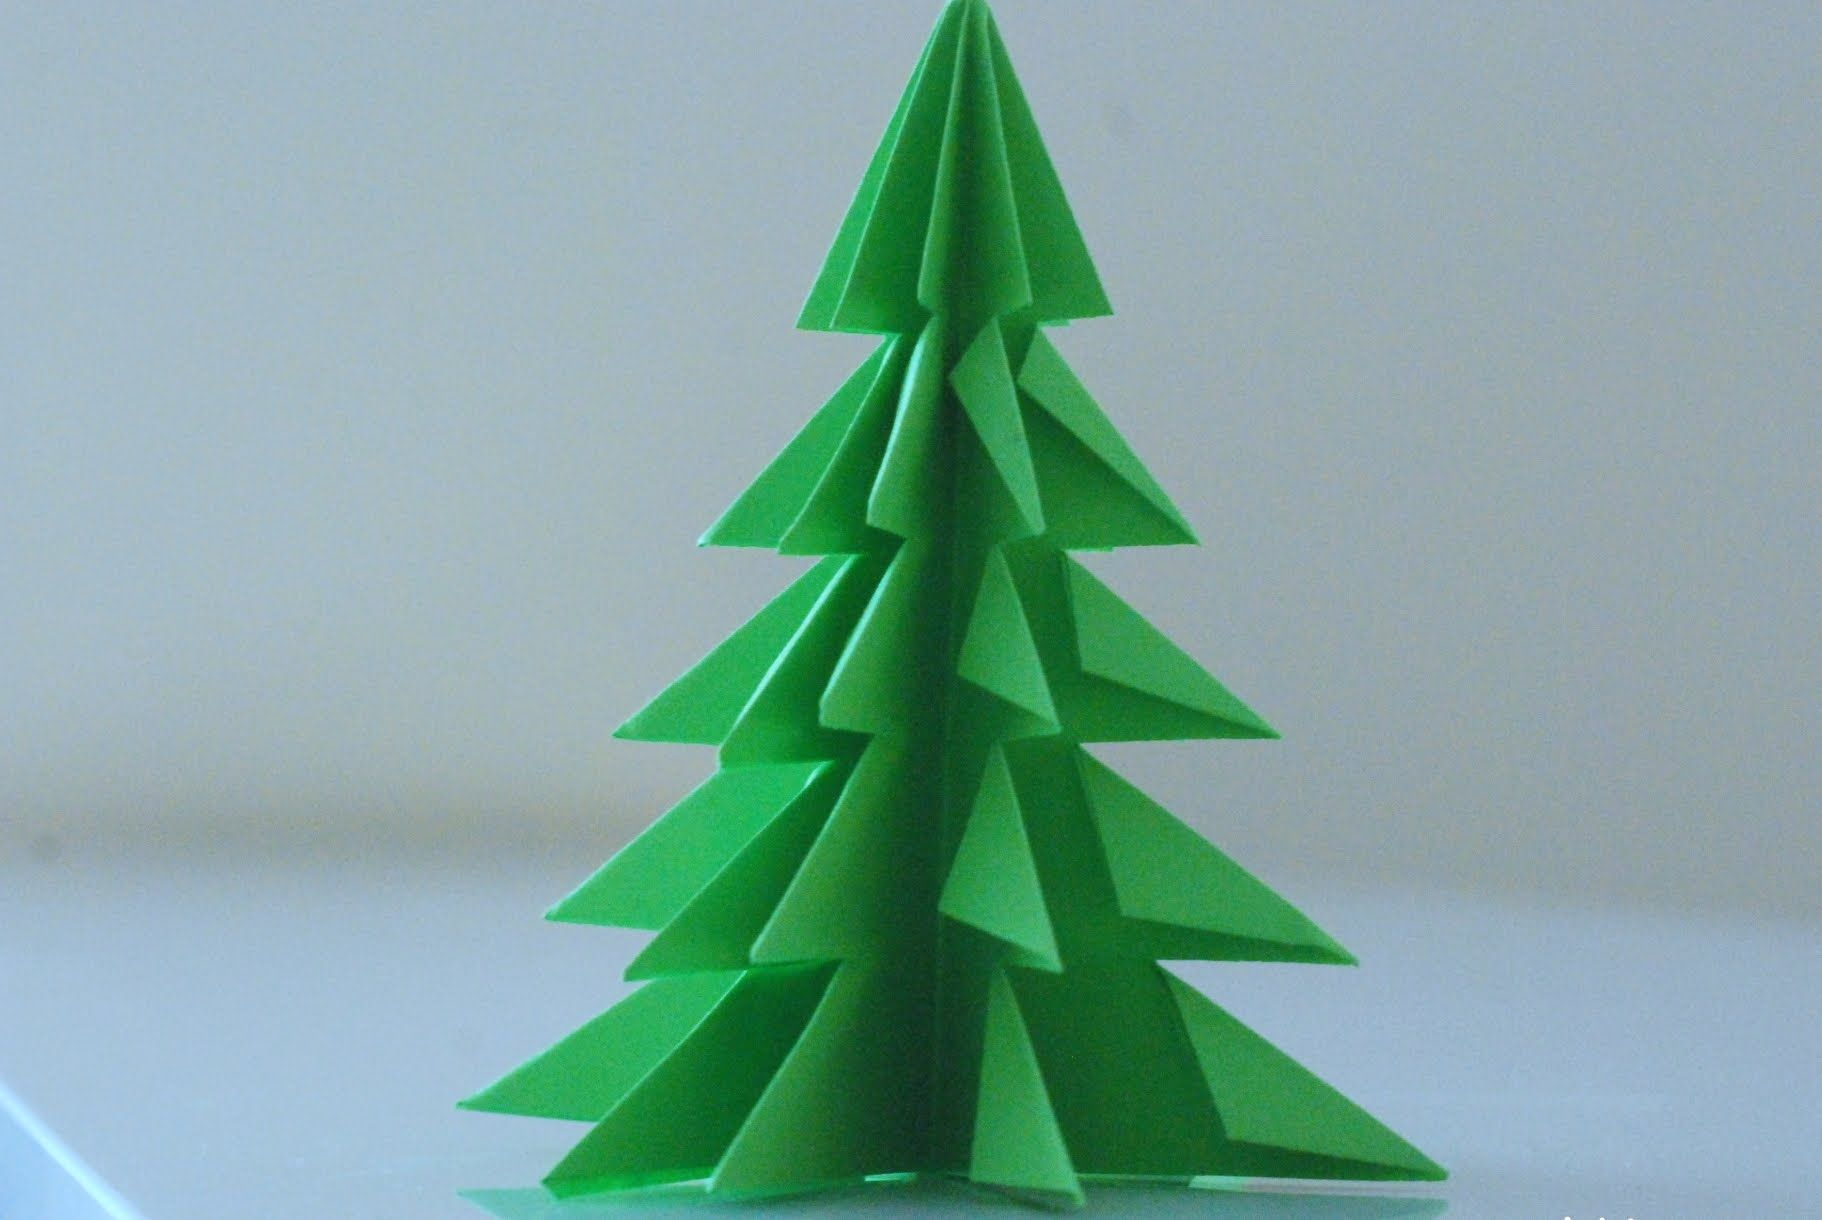 Jak Zrobic Choinke Z Papieru How To Make A Paper Christmas Tree Diy Xmas Gifts Paper Christmas Decorations Paper Christmas Tree